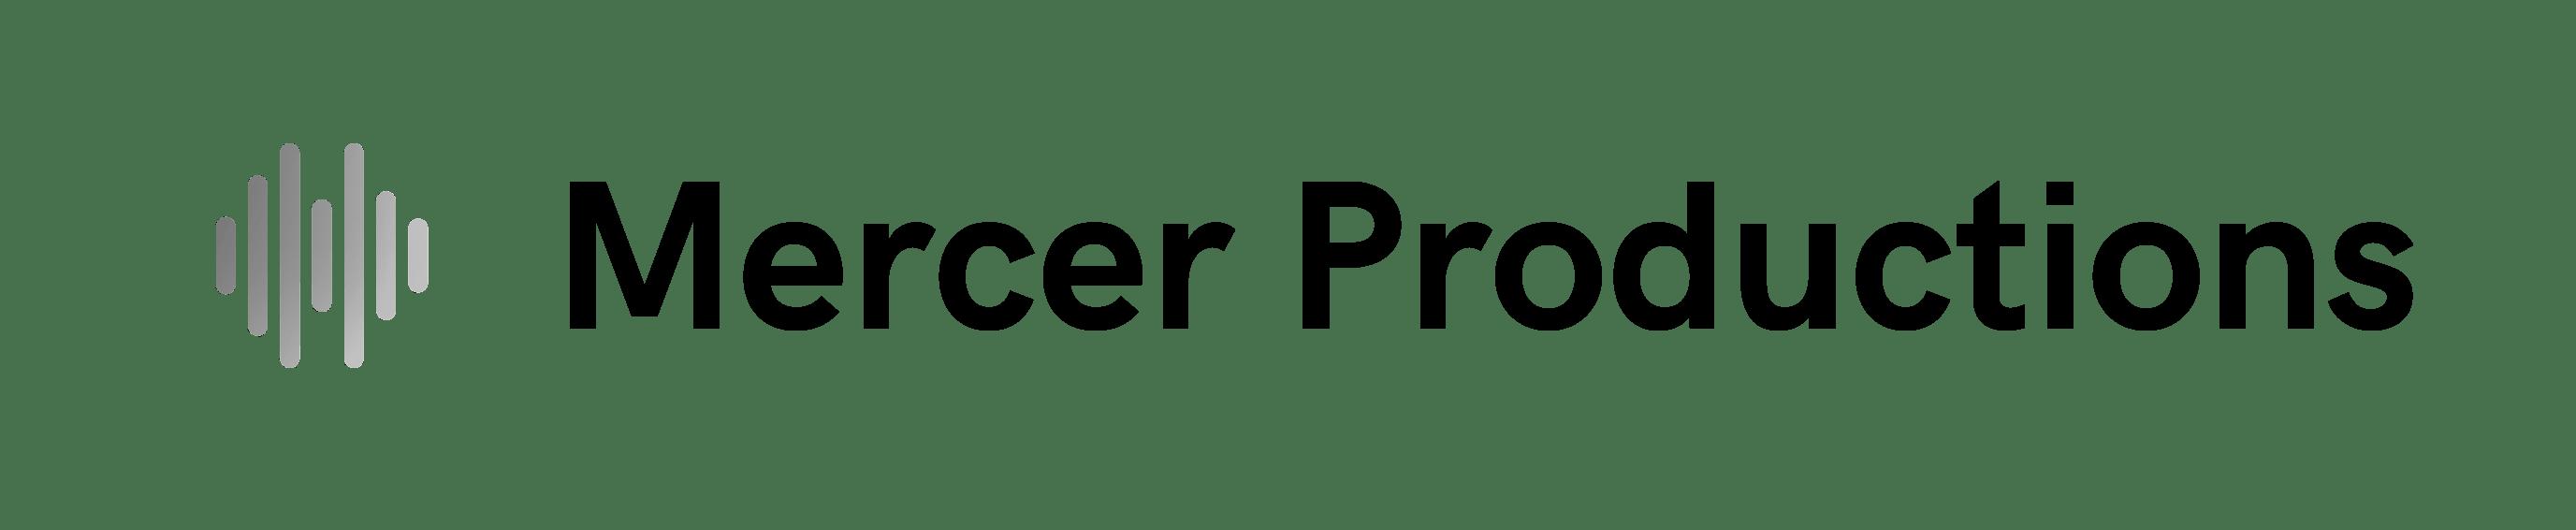 Mercer Productions